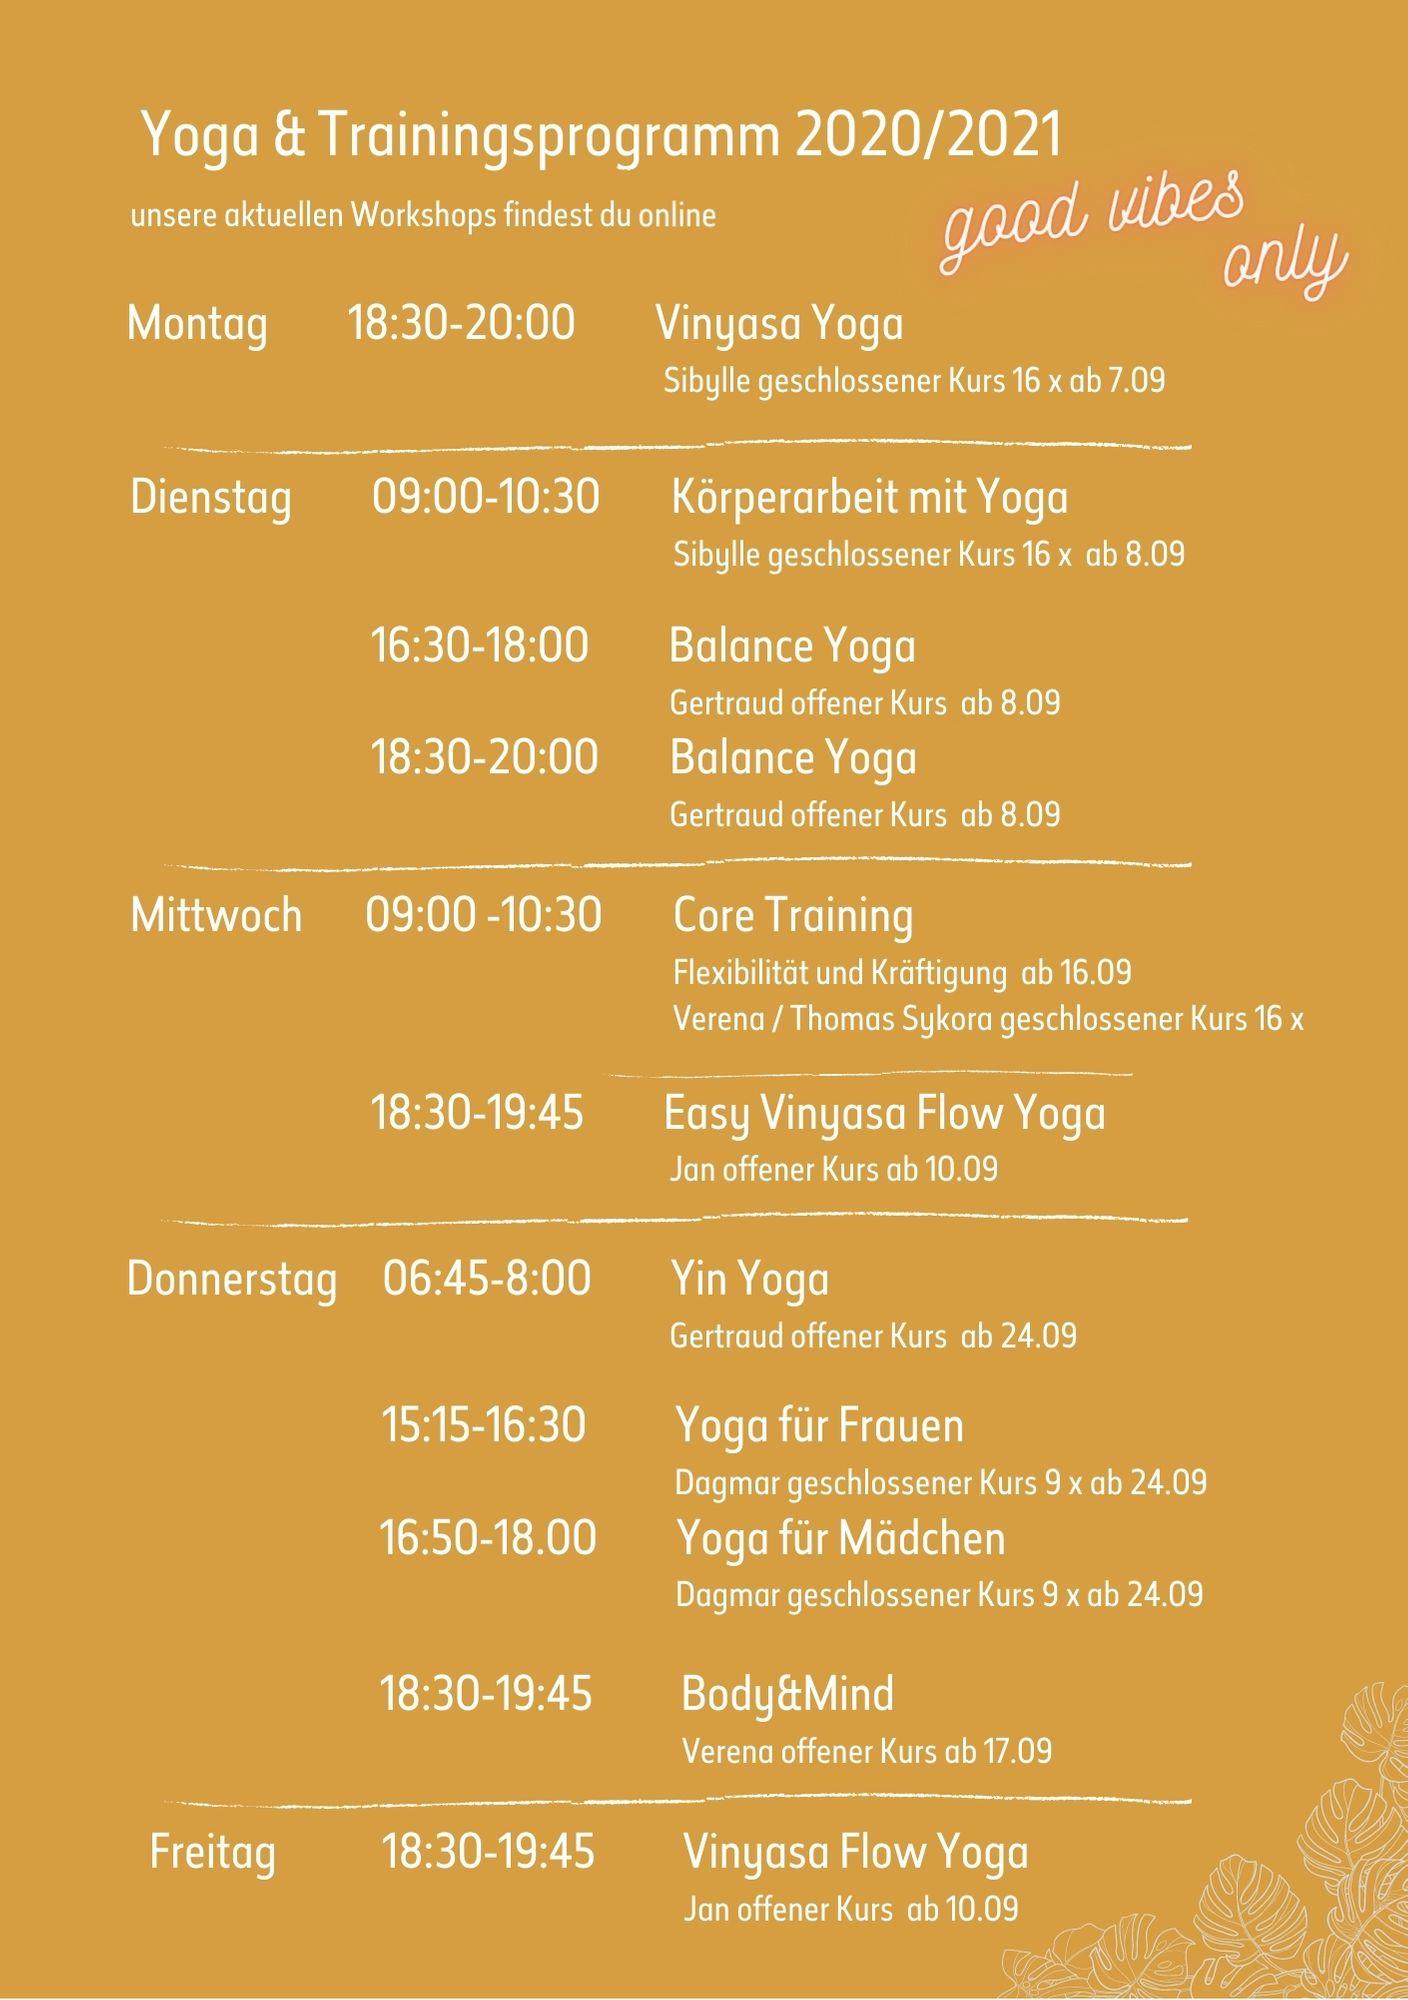 Yoga & Trainingskursplan 2020/21